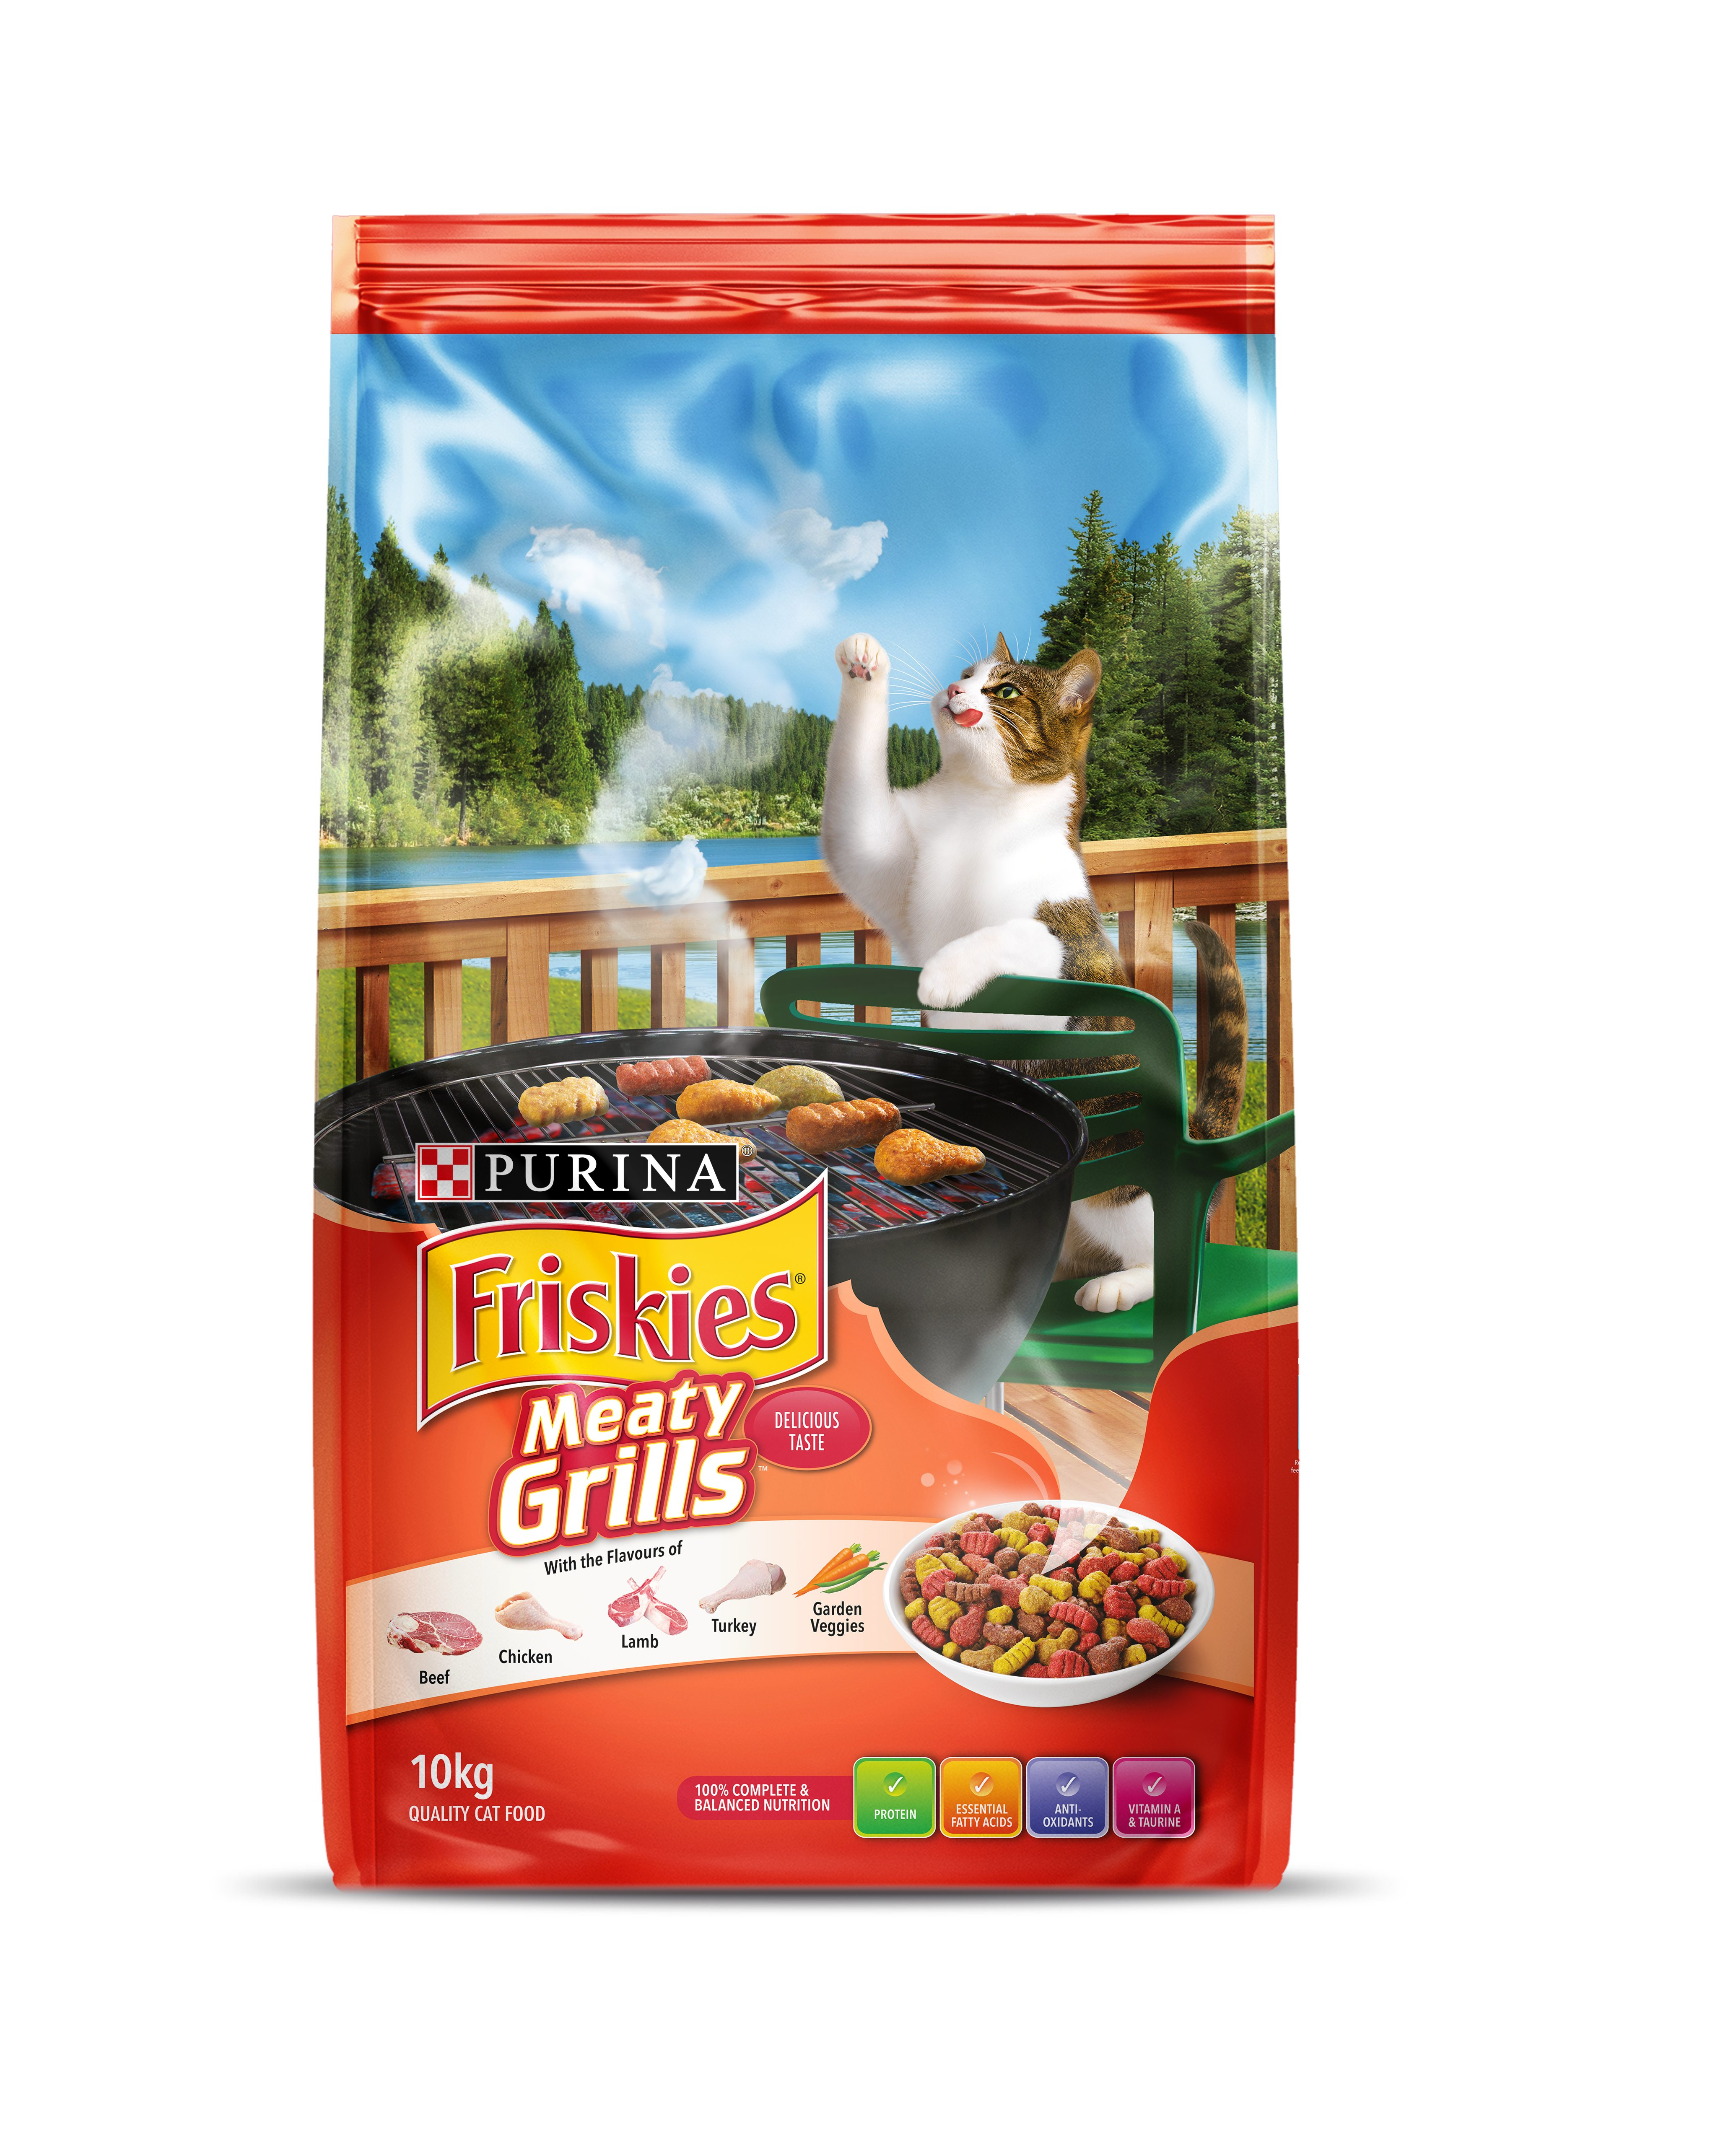 Nestle Purina Friskies Adult Meaty Grills 10kg Adelaide